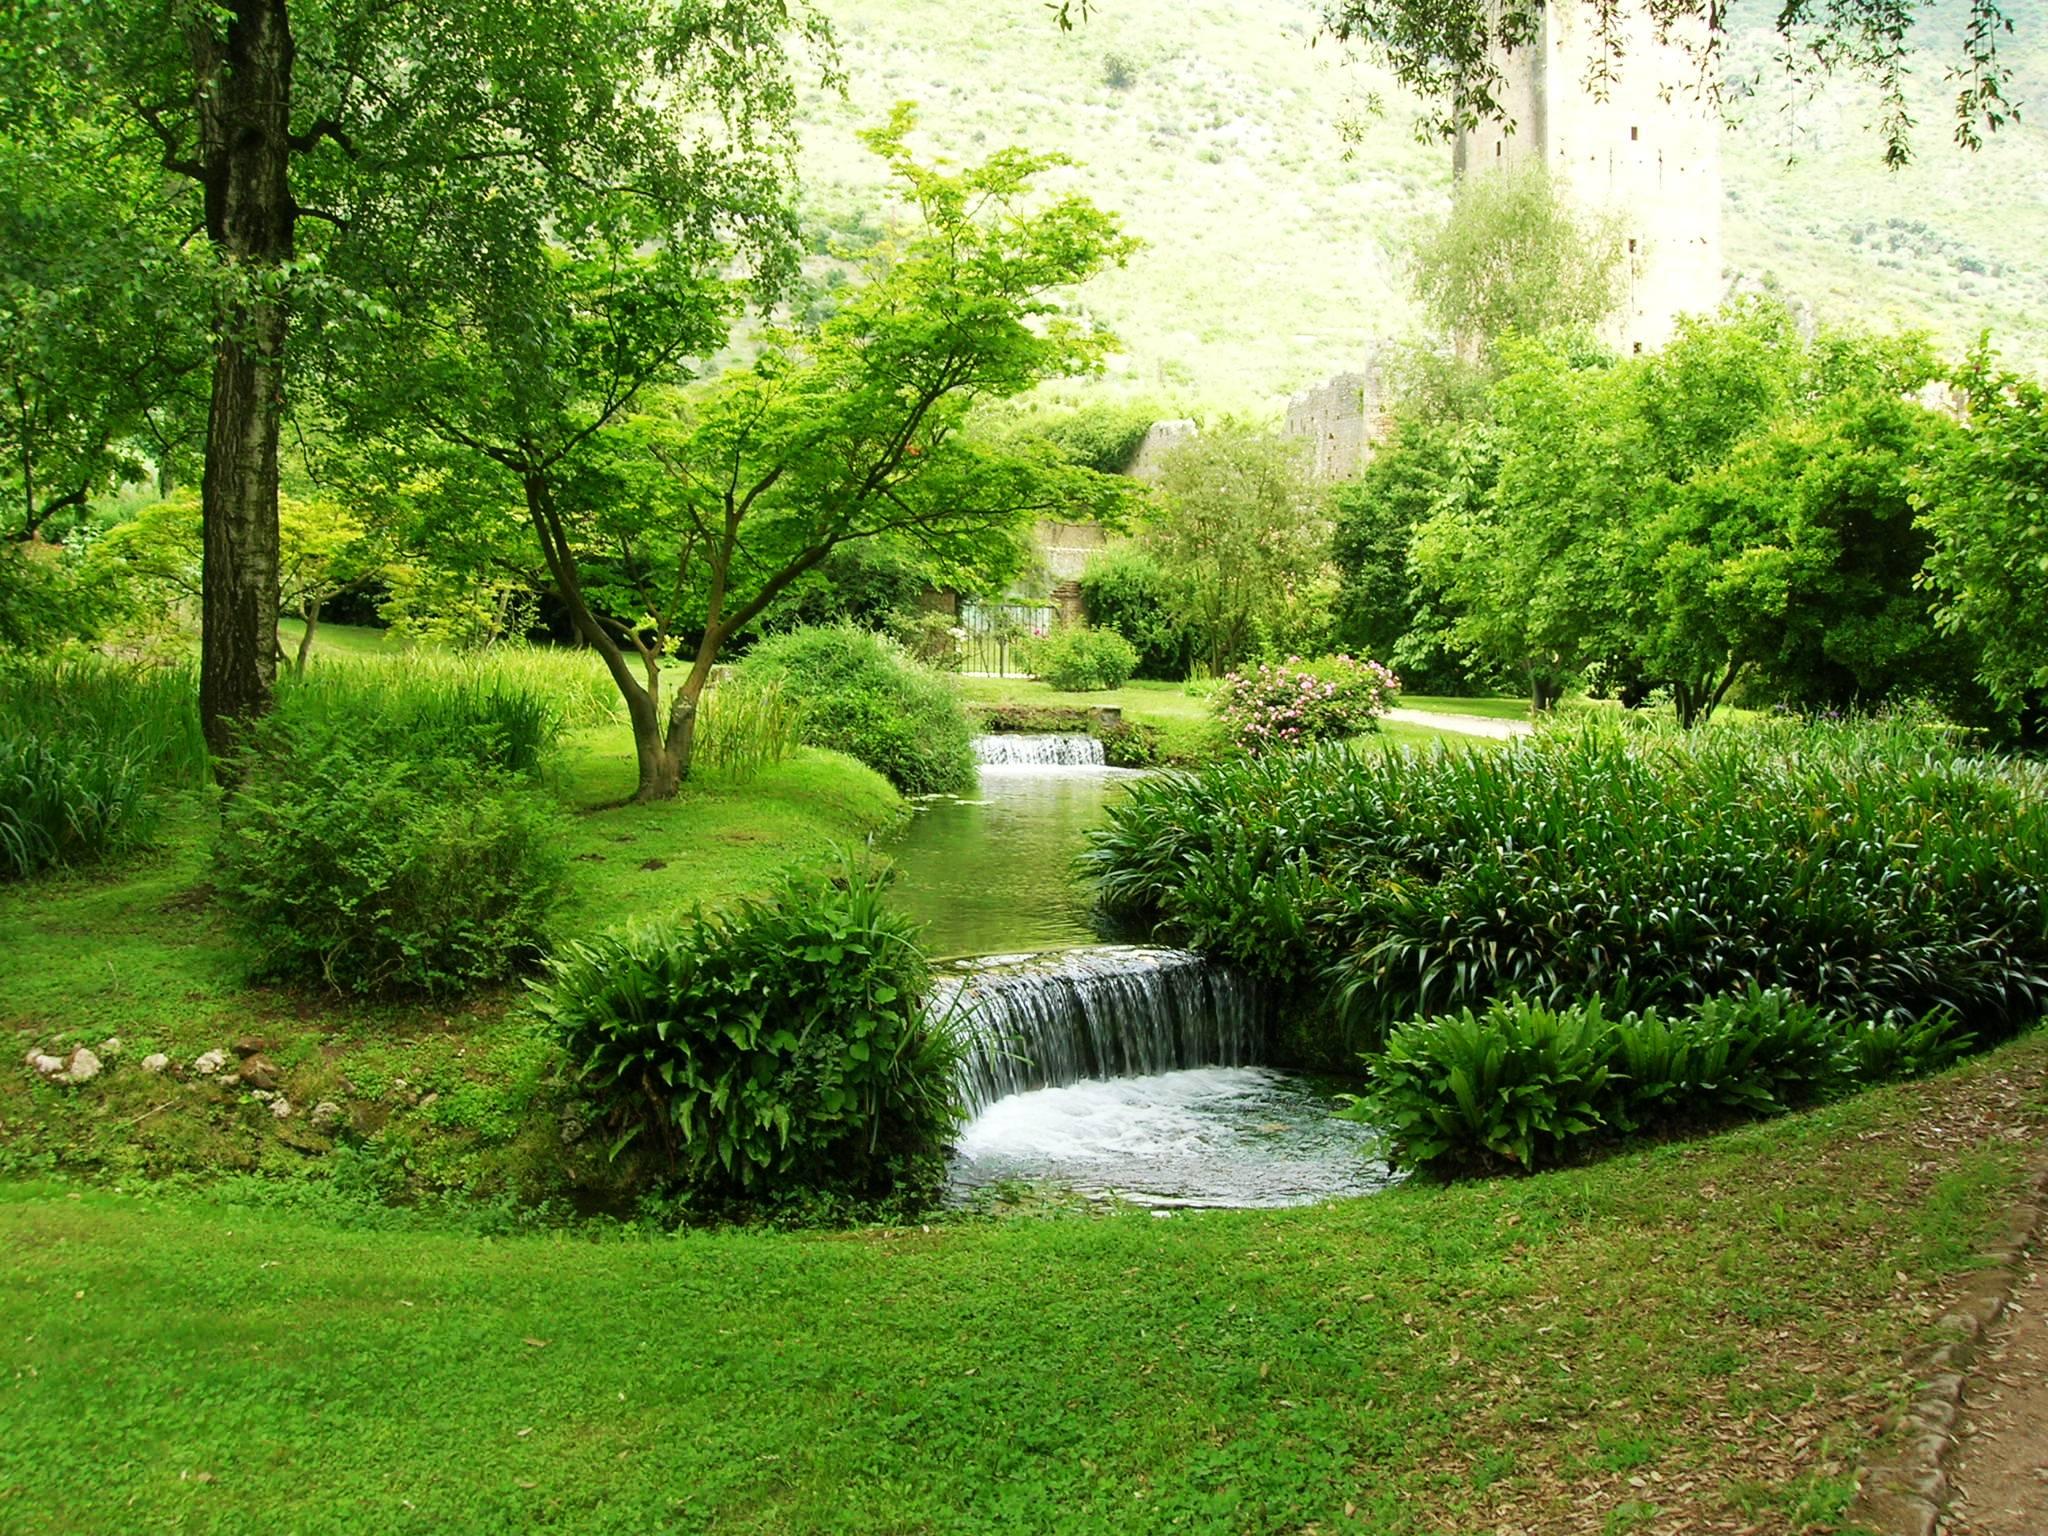 File giardino di ninfa wikimedia commons - Foto ville con giardino ...